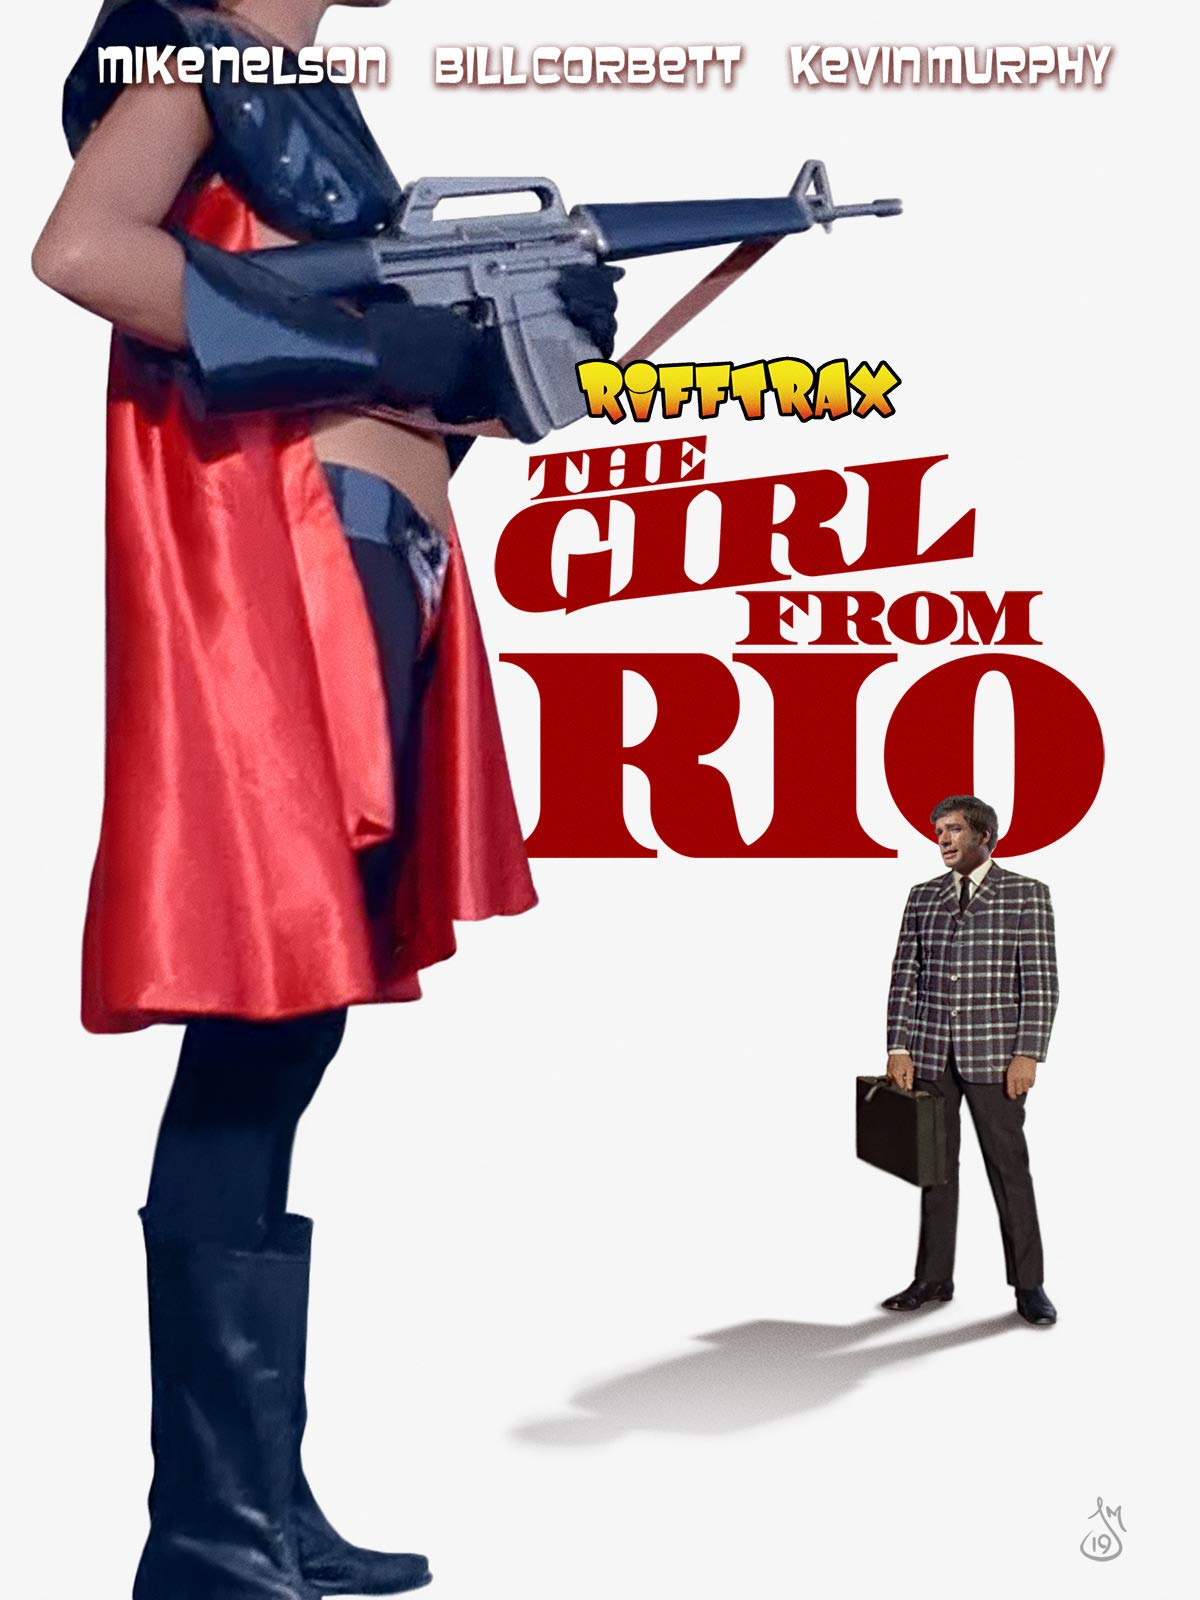 RiffTrax: The Girl from Rio